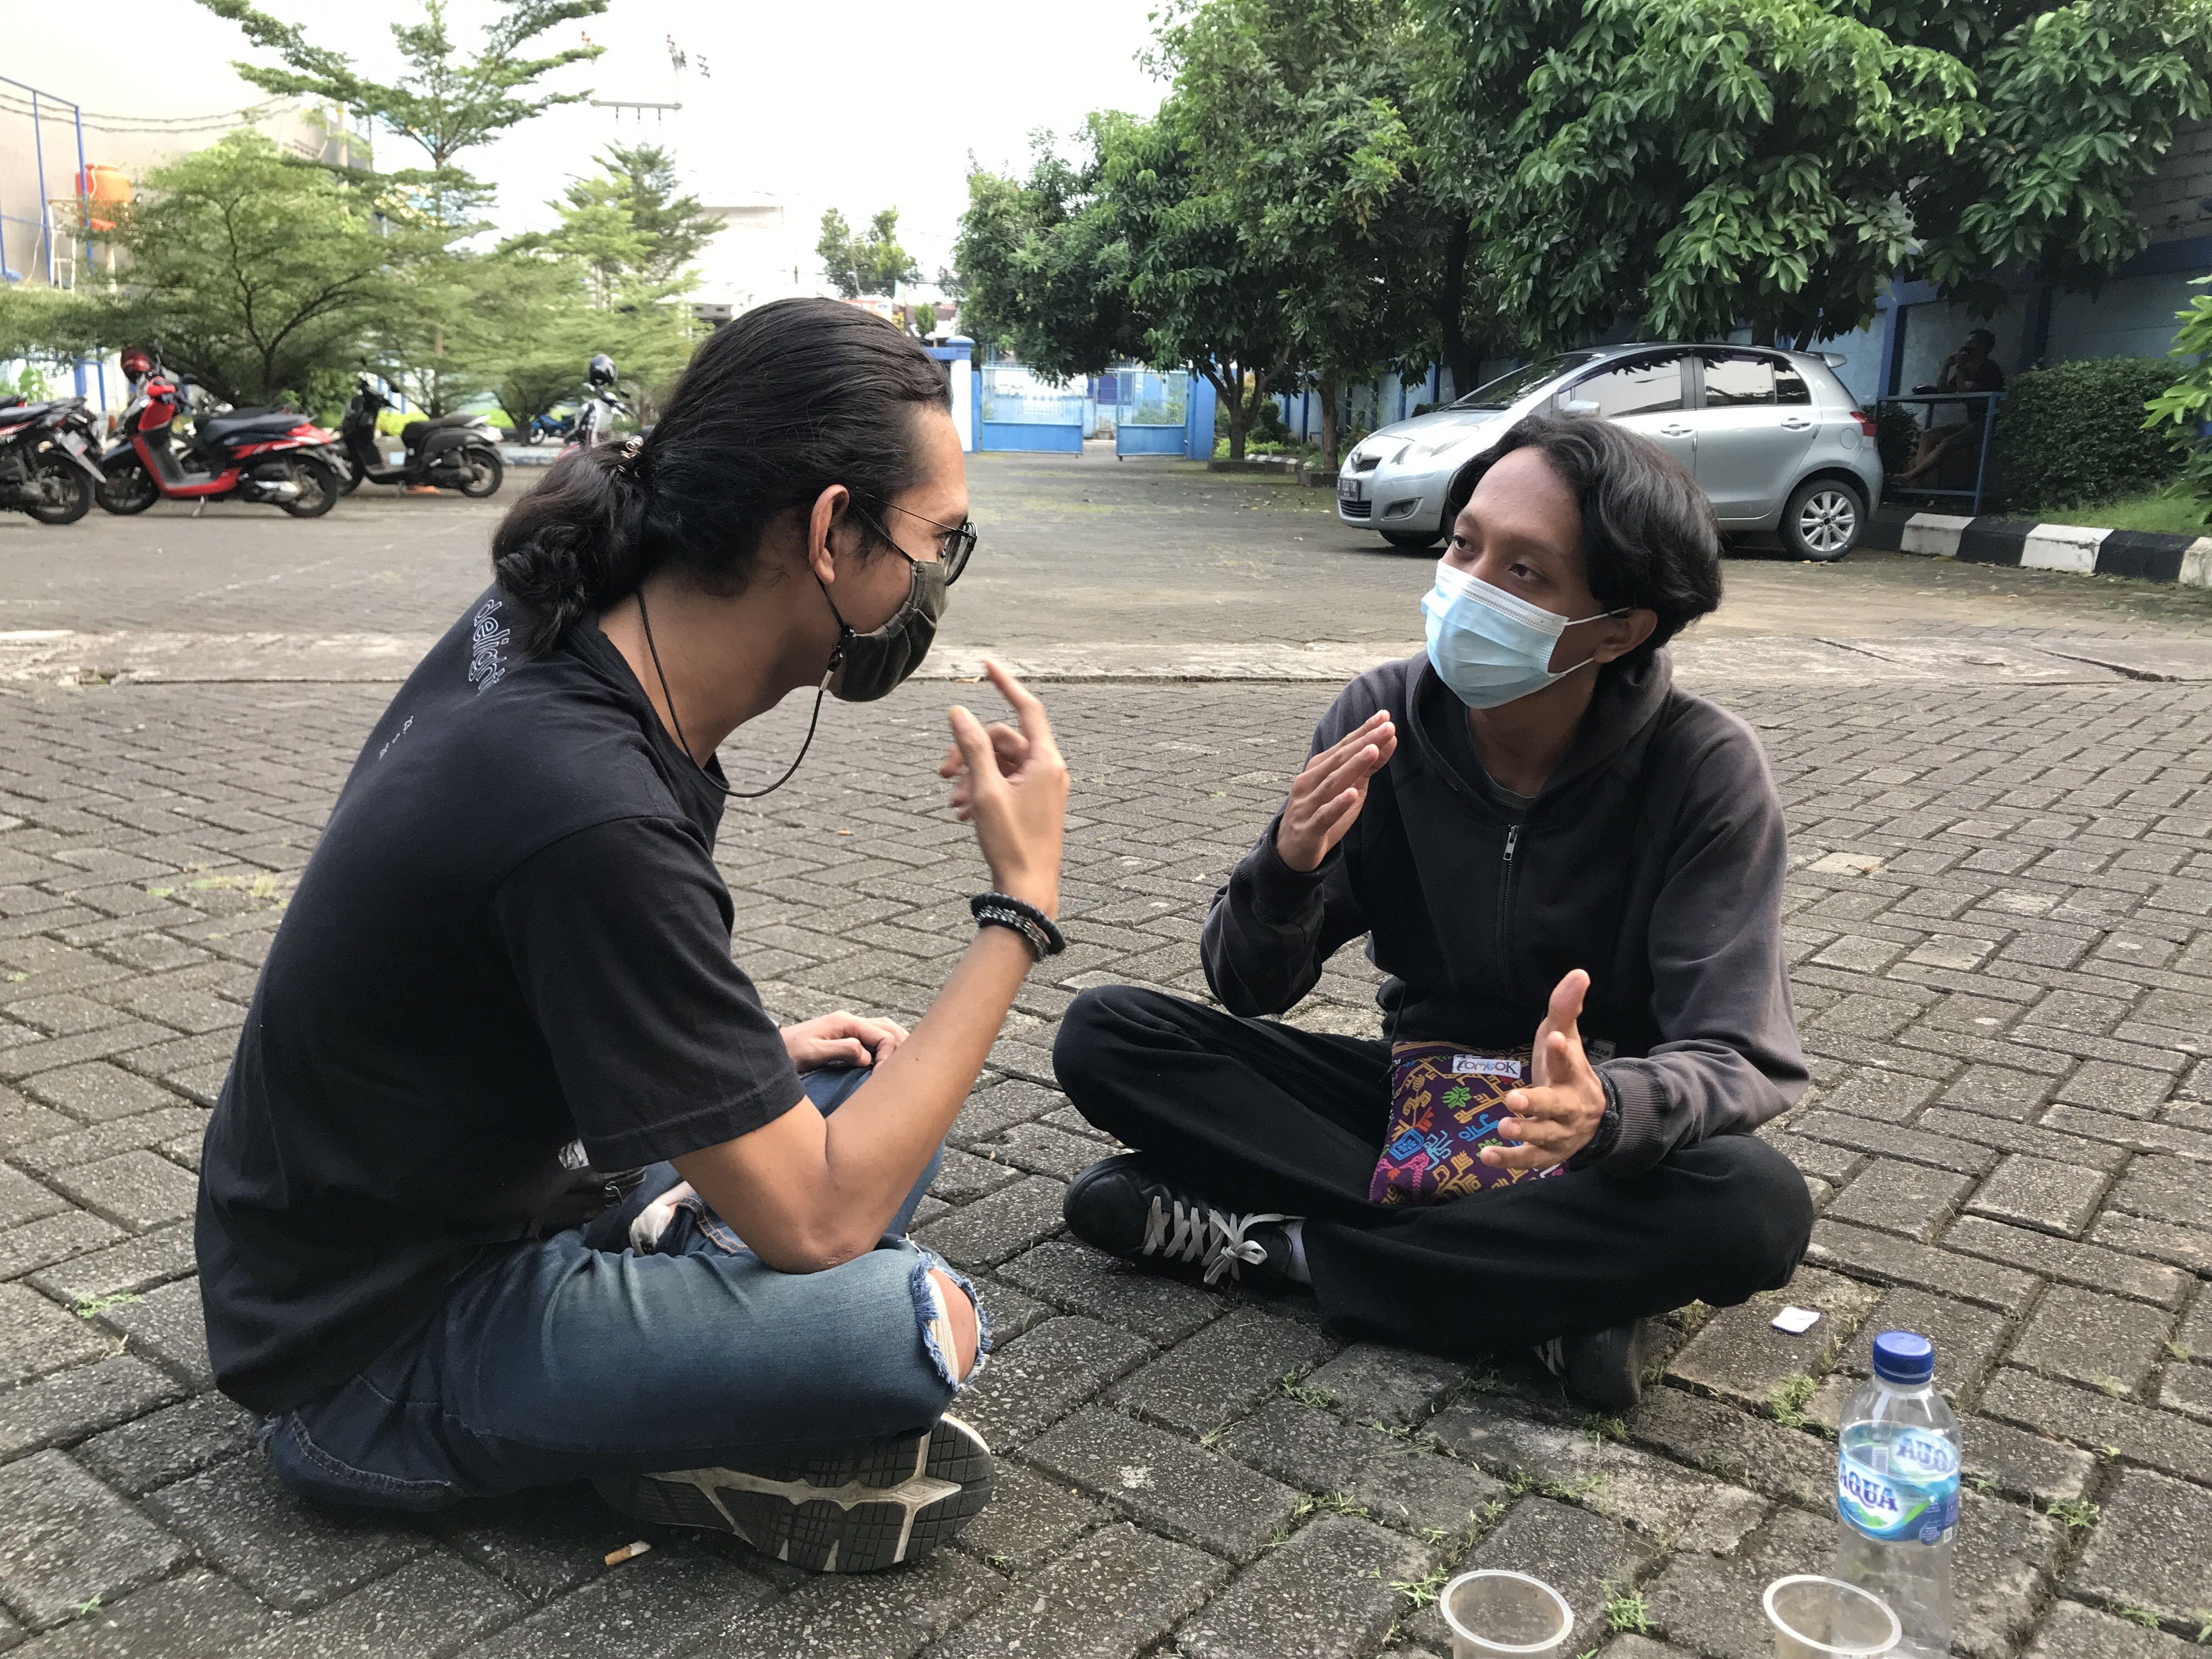 Salah Satu Mahasiswa Menolak Mudik, Sesuai Penetapan Yang Diberlakukan Pemerintah